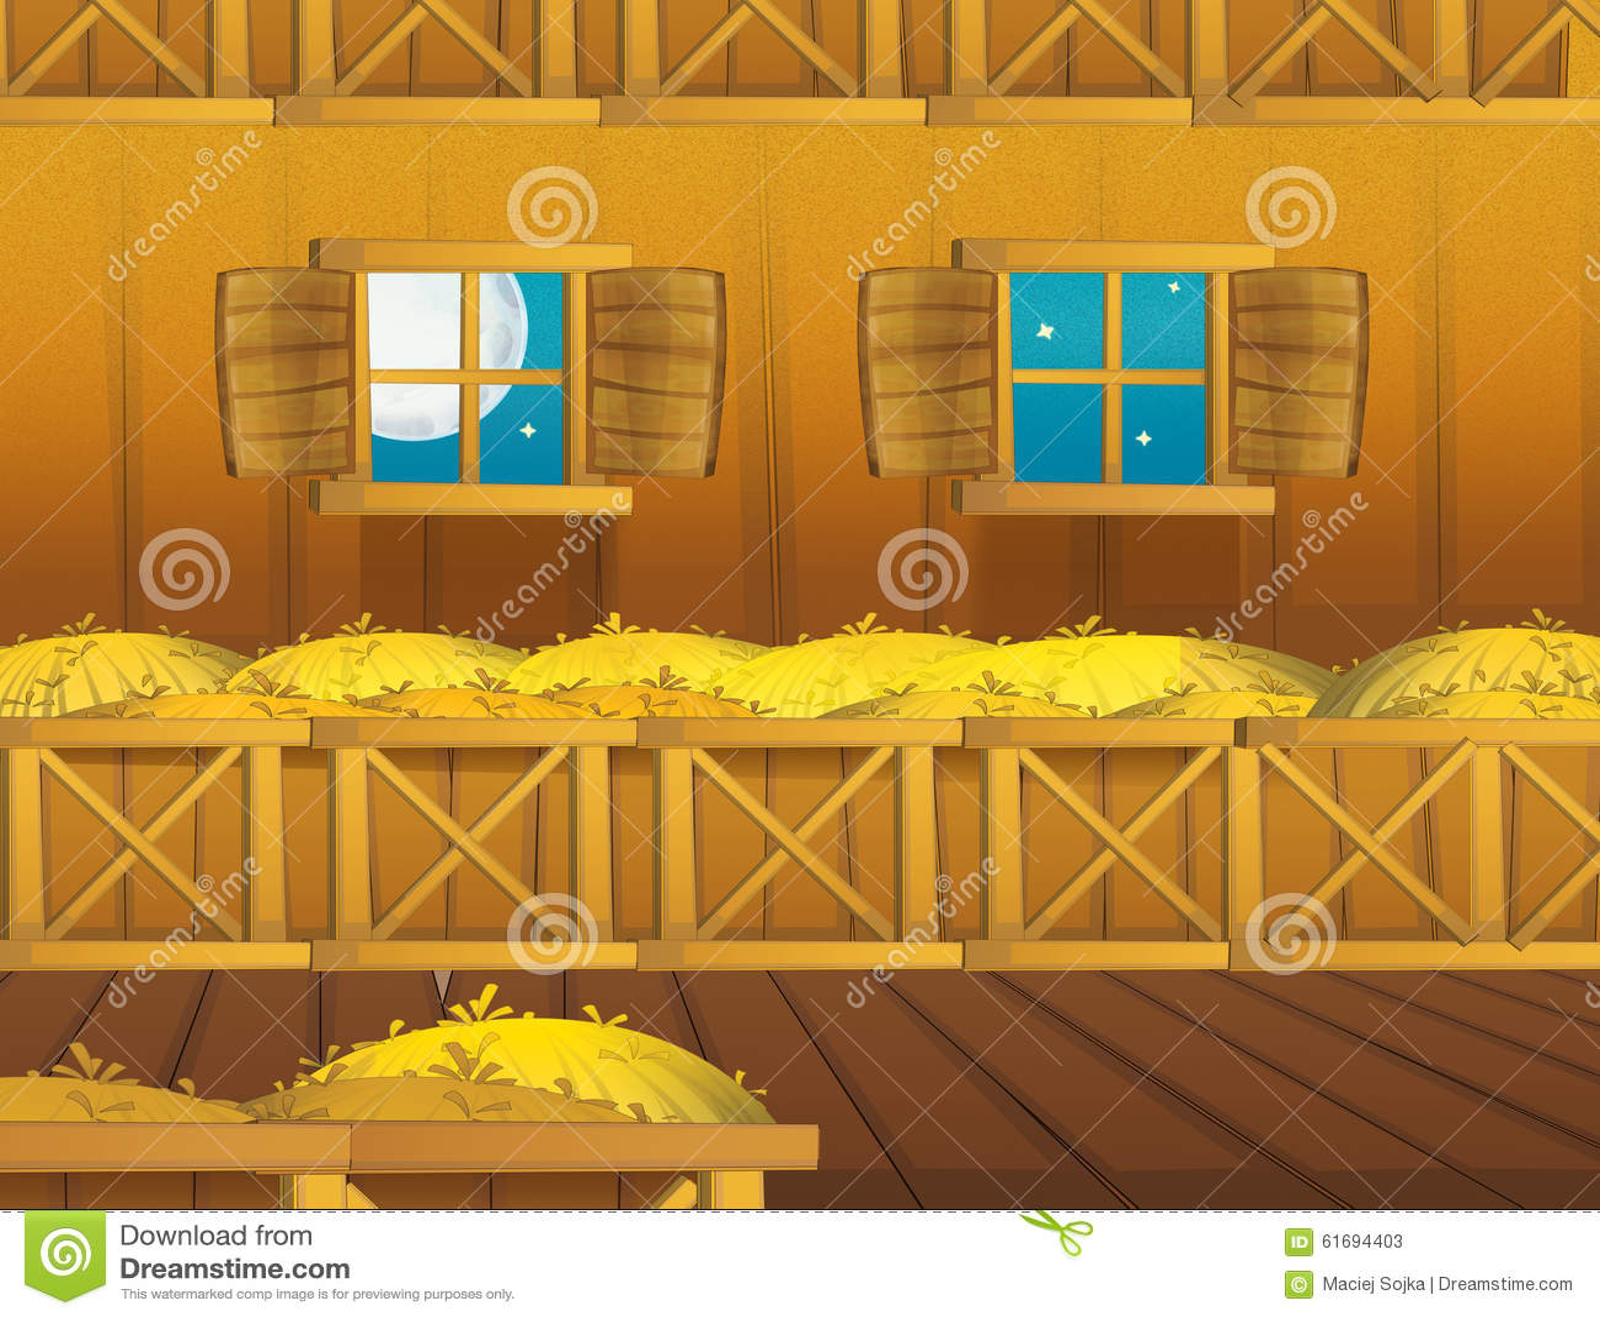 Cartoon Farm Scene With Wooden Barn Interior